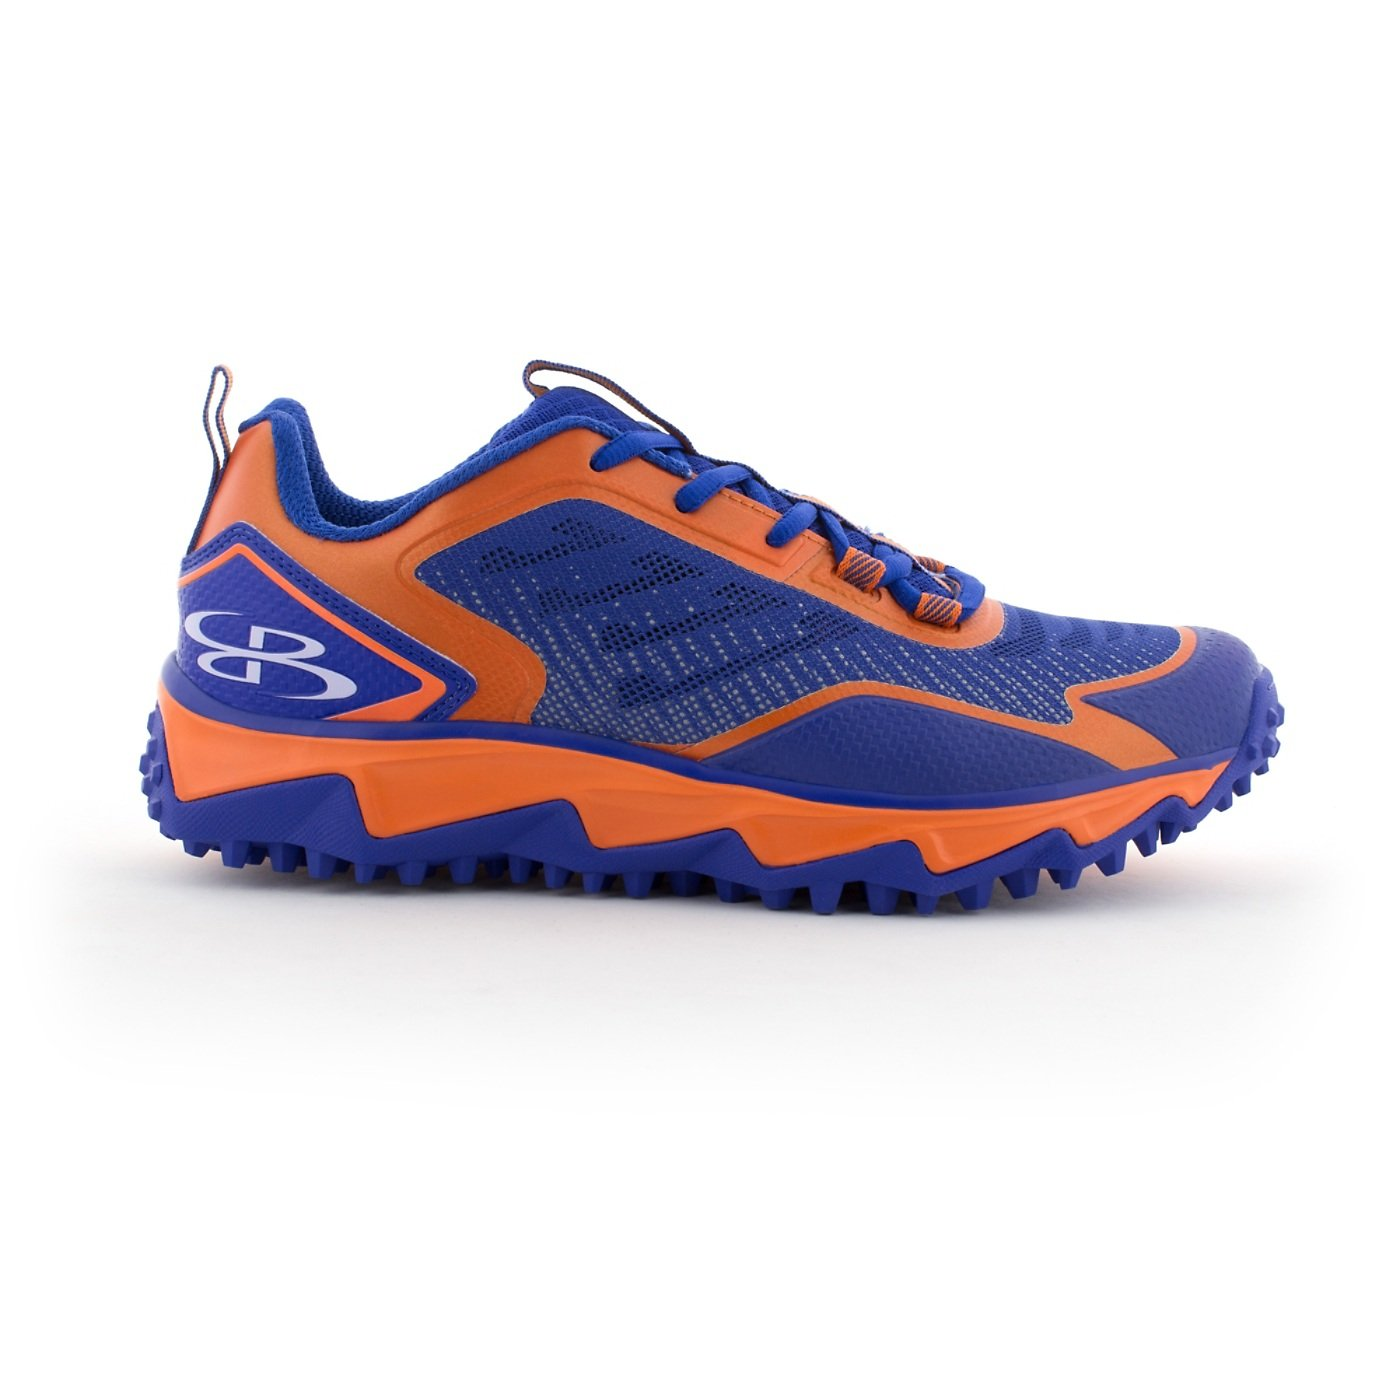 BoombahメンズBerzerk Turf Shoes – 13色オプション – 複数のサイズ B076B19B84 12|ロイヤル/オレンジ ロイヤル/オレンジ 12